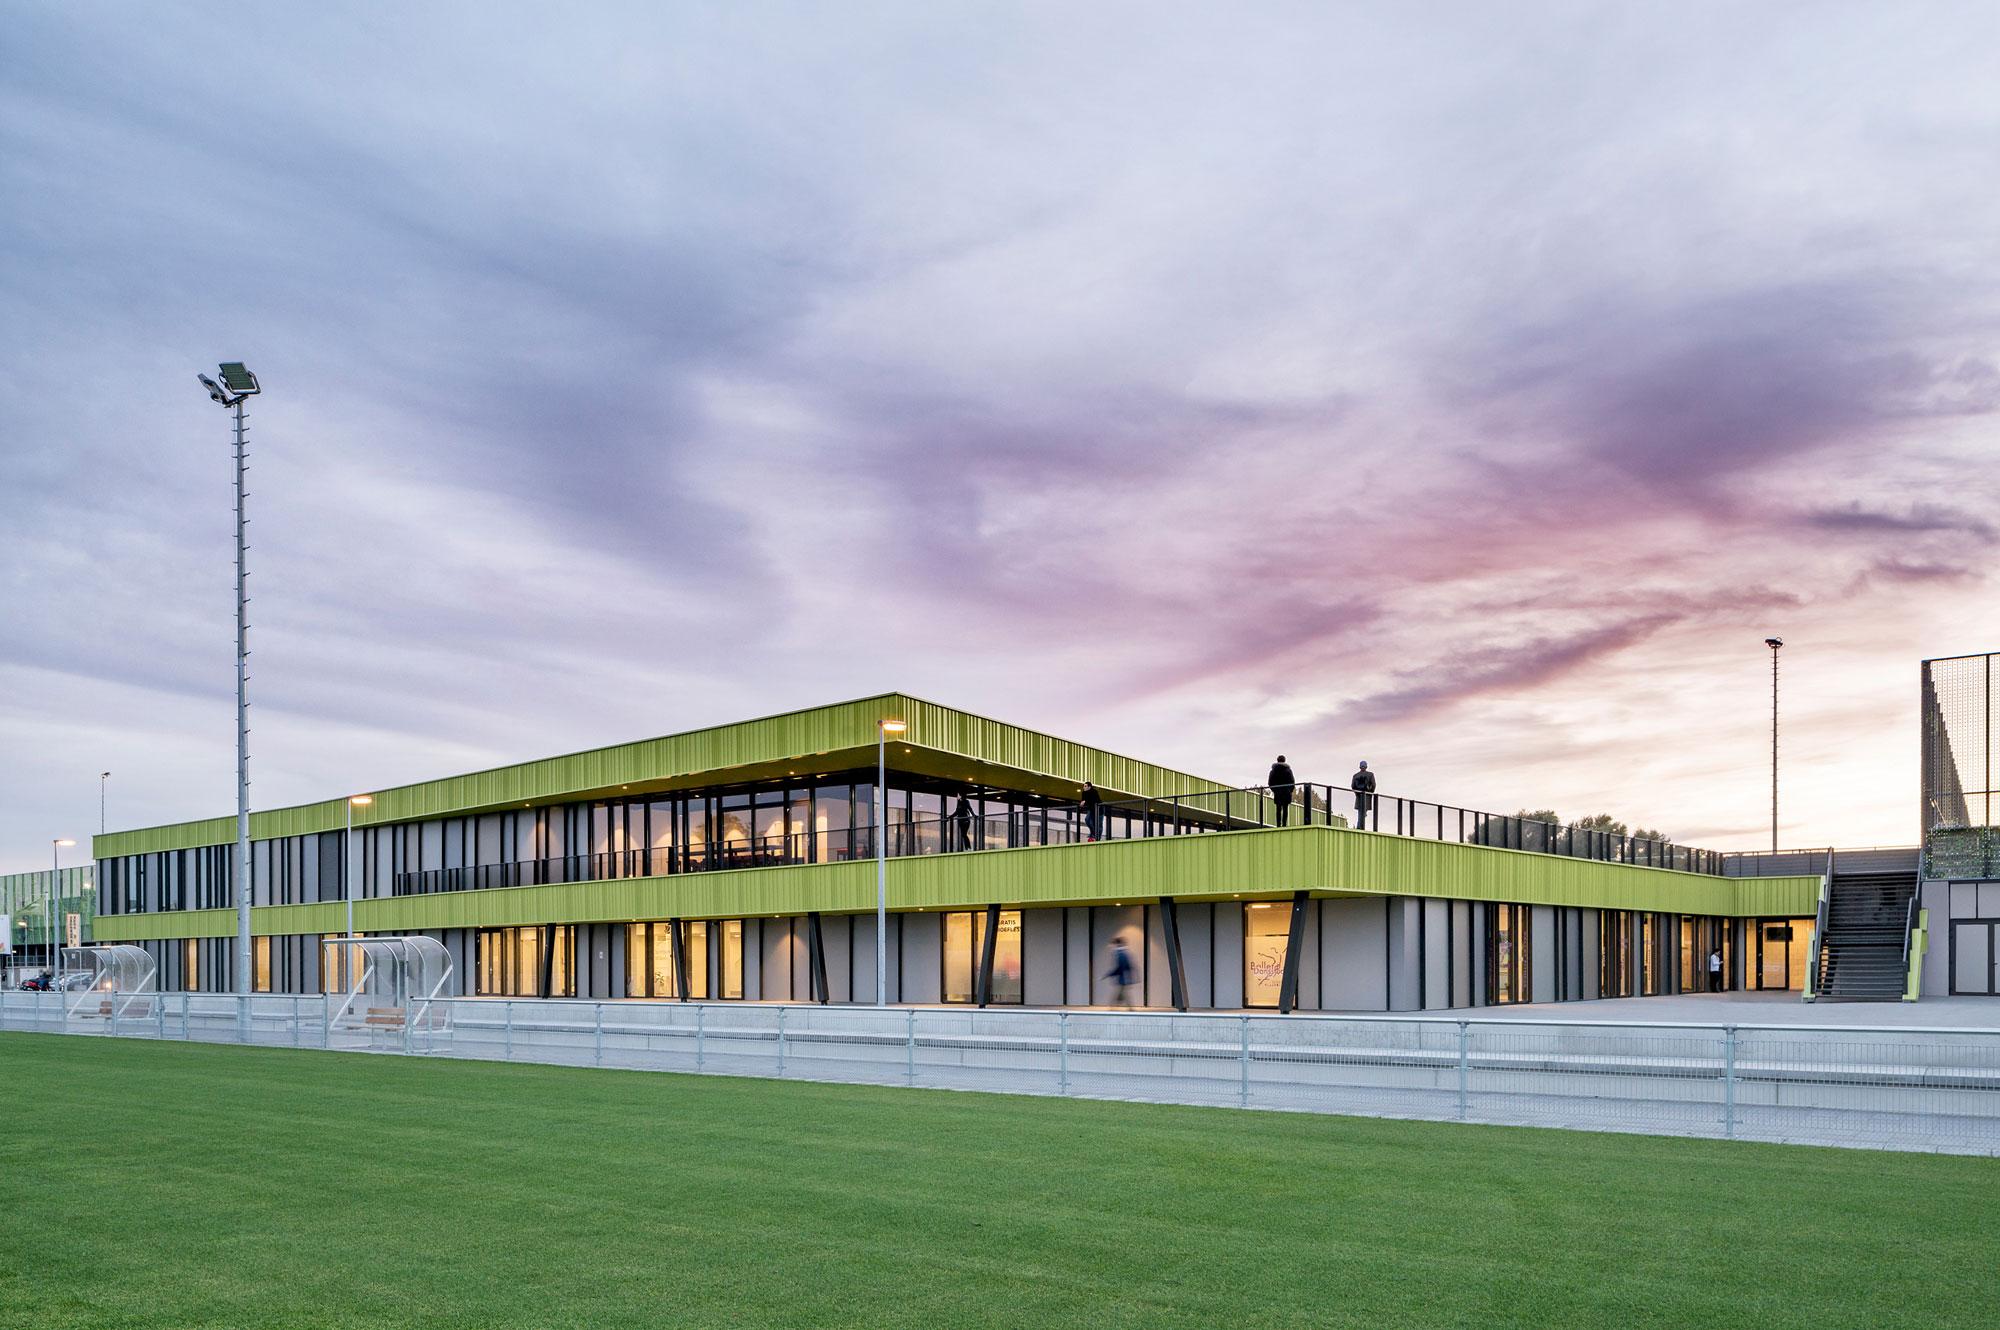 sportpark willem alexander moederscheimmoonen architects de architect. Black Bedroom Furniture Sets. Home Design Ideas